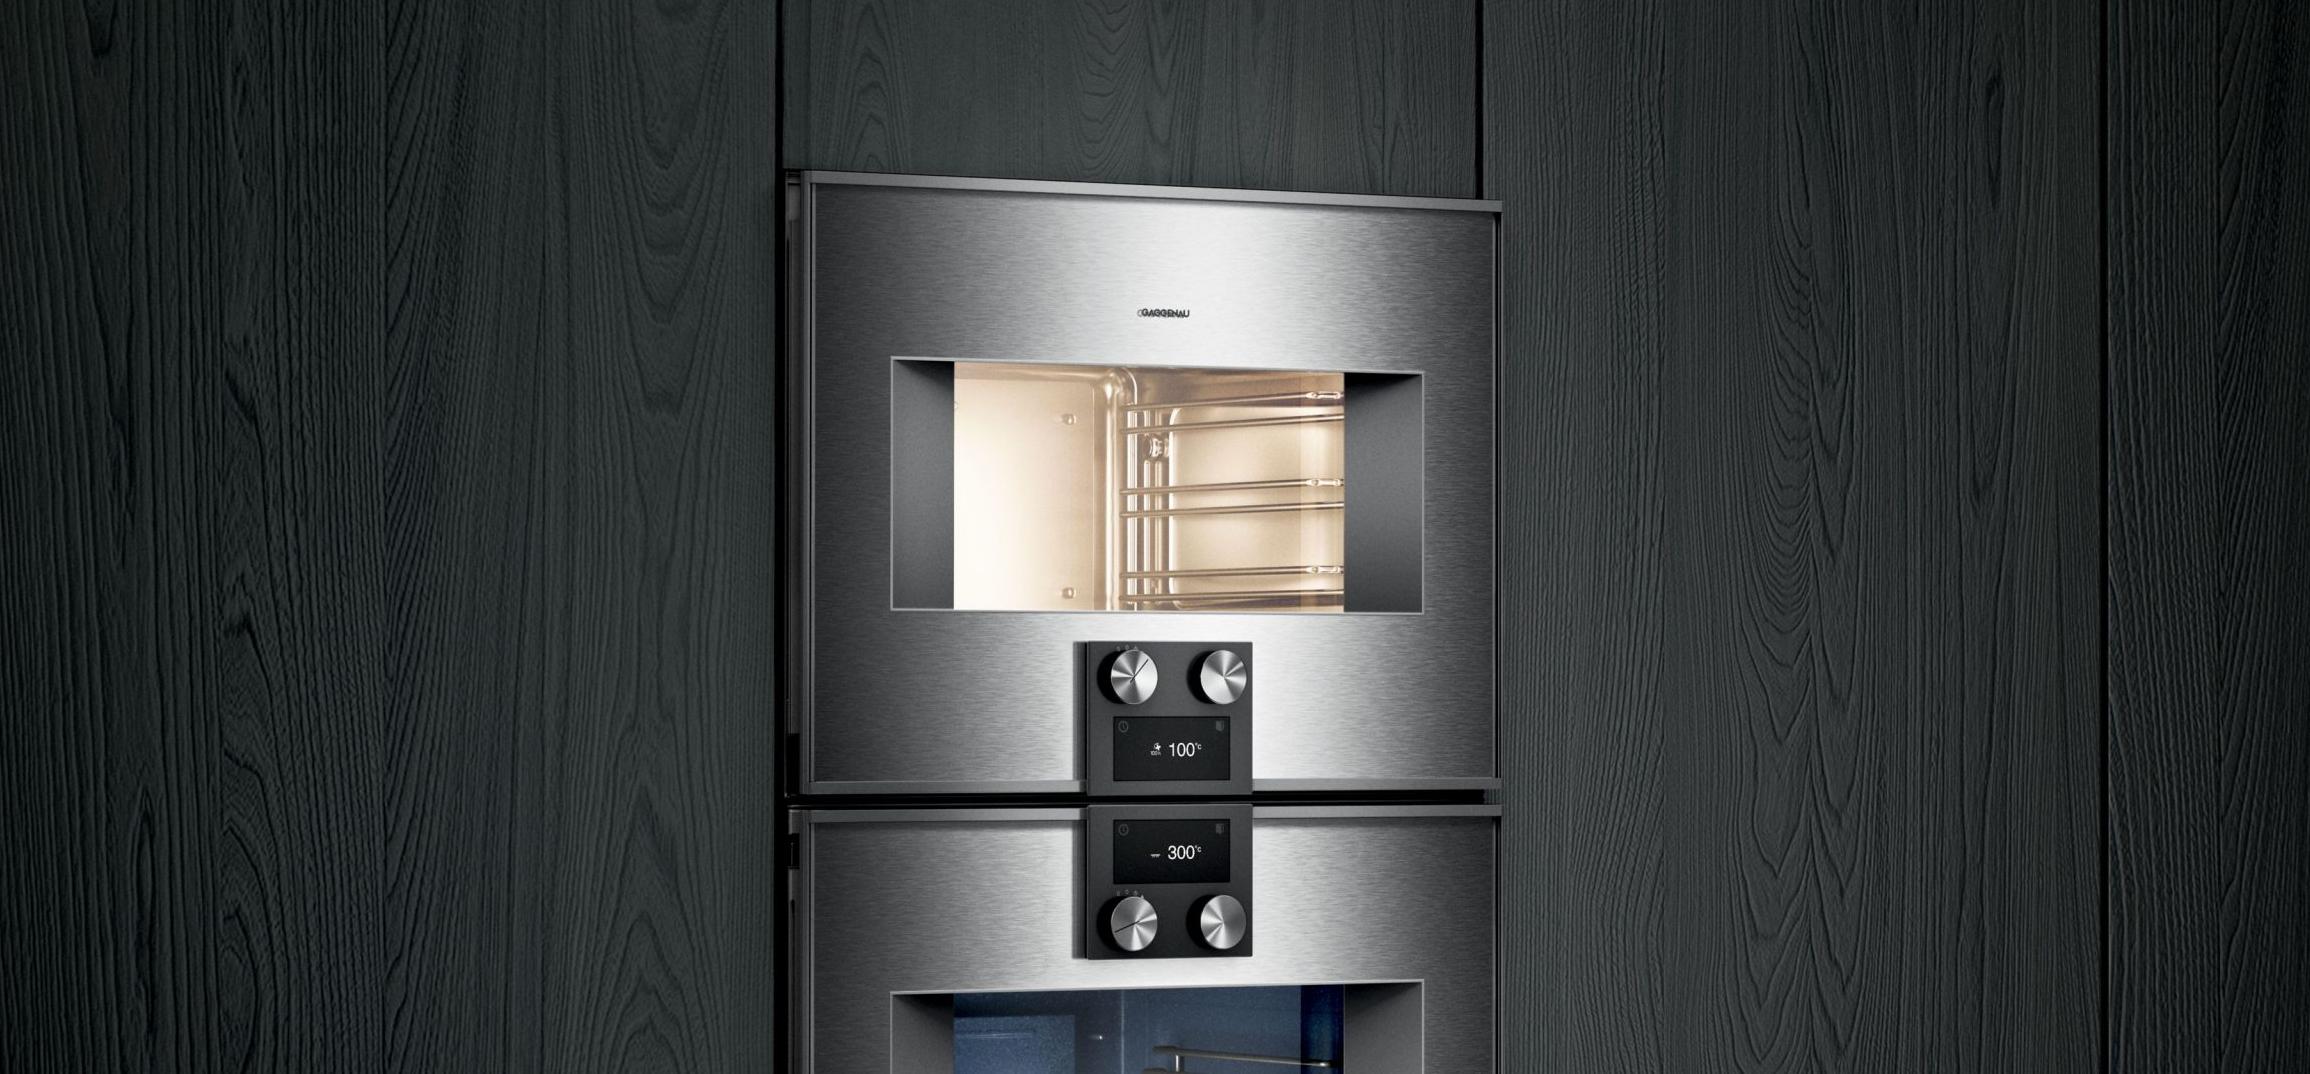 Combi-steam oven 400 series – 60 x 45 cm